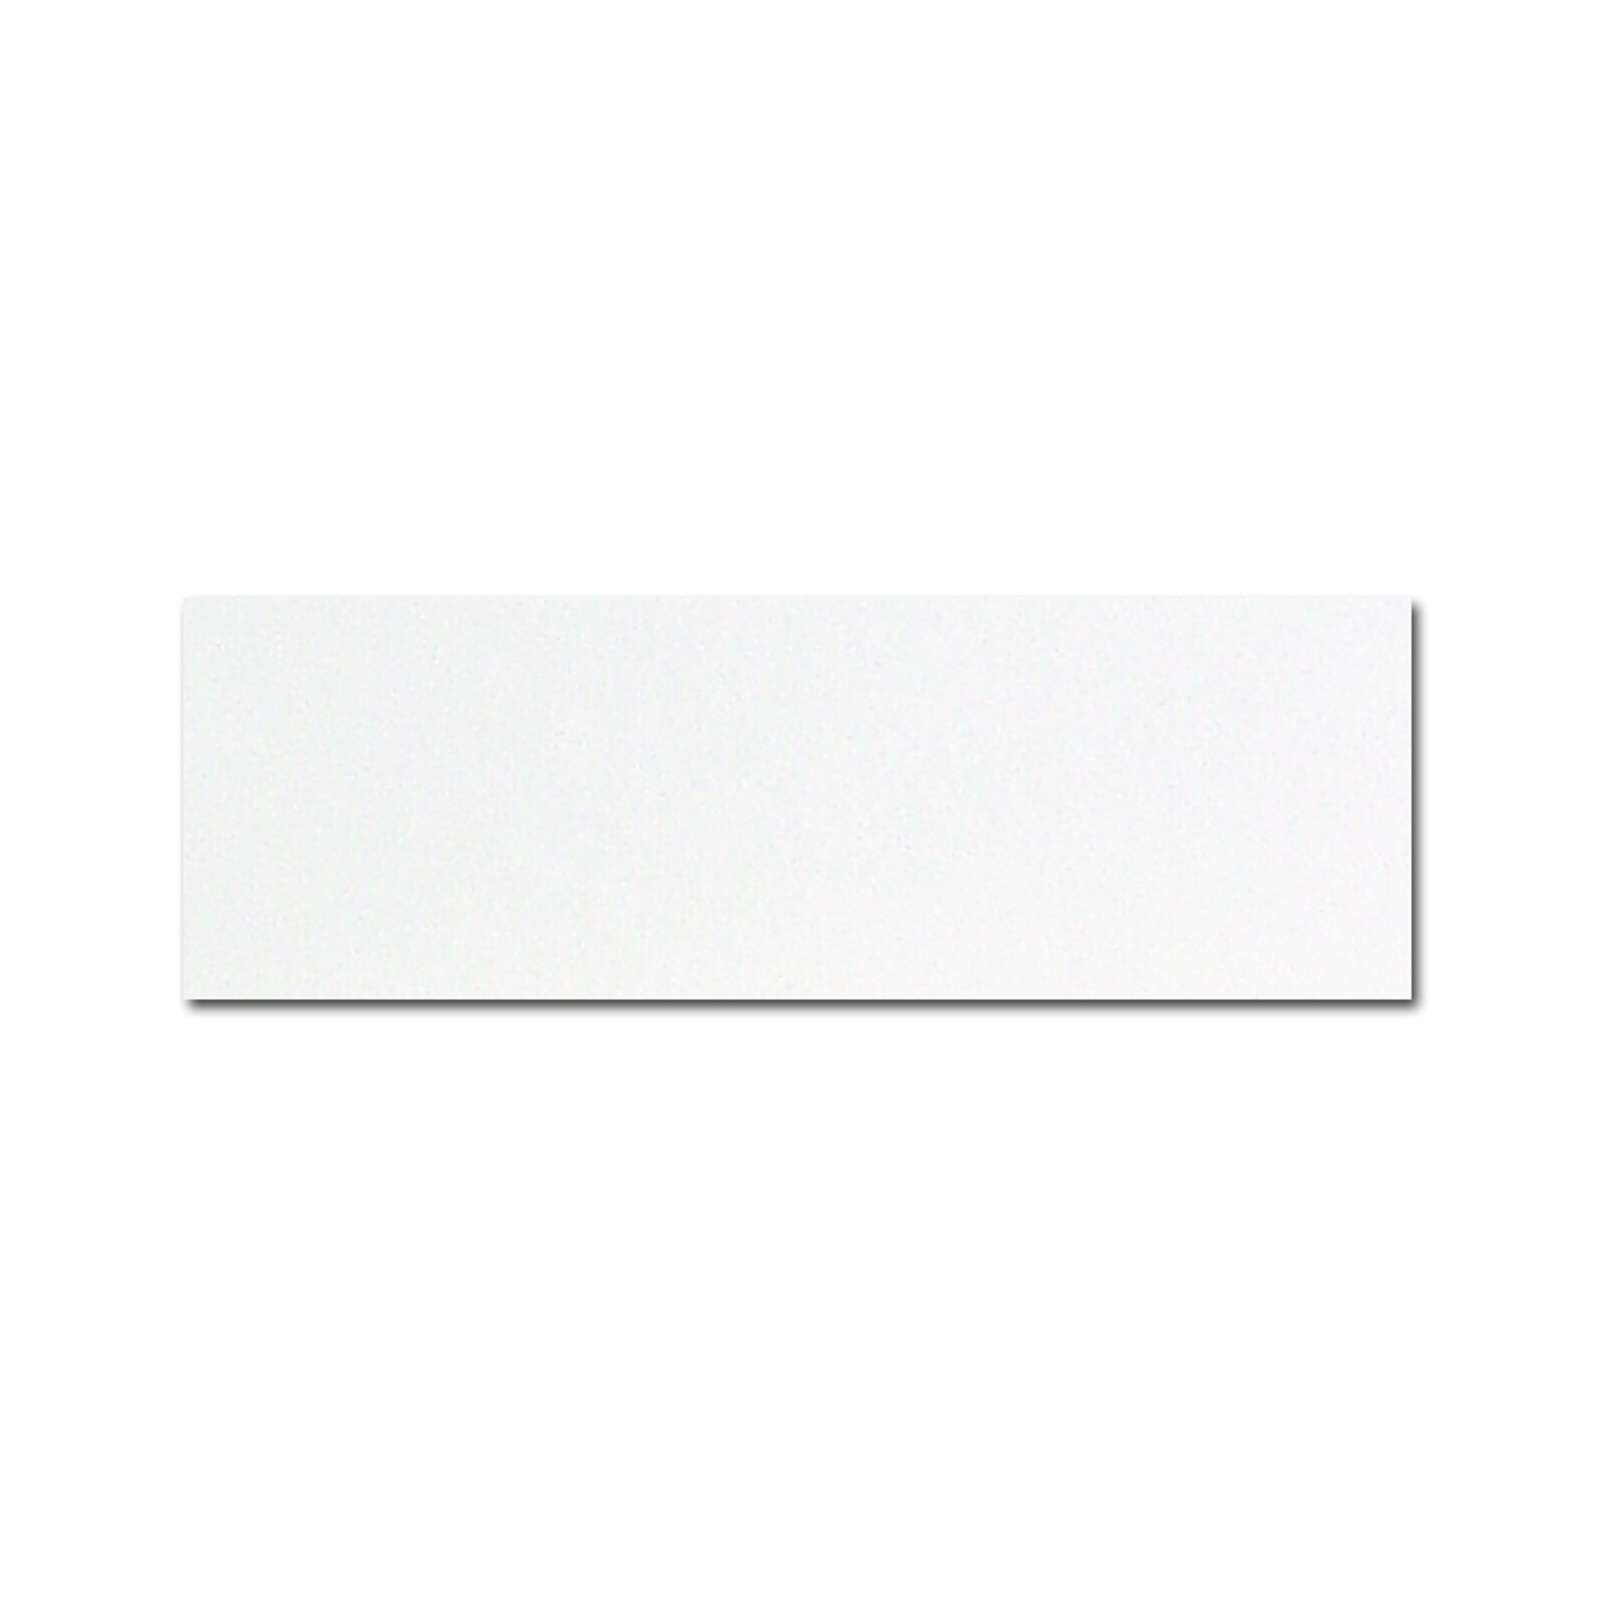 Кромочная лента меламиновая с клеем 19мм белая (5м) Element